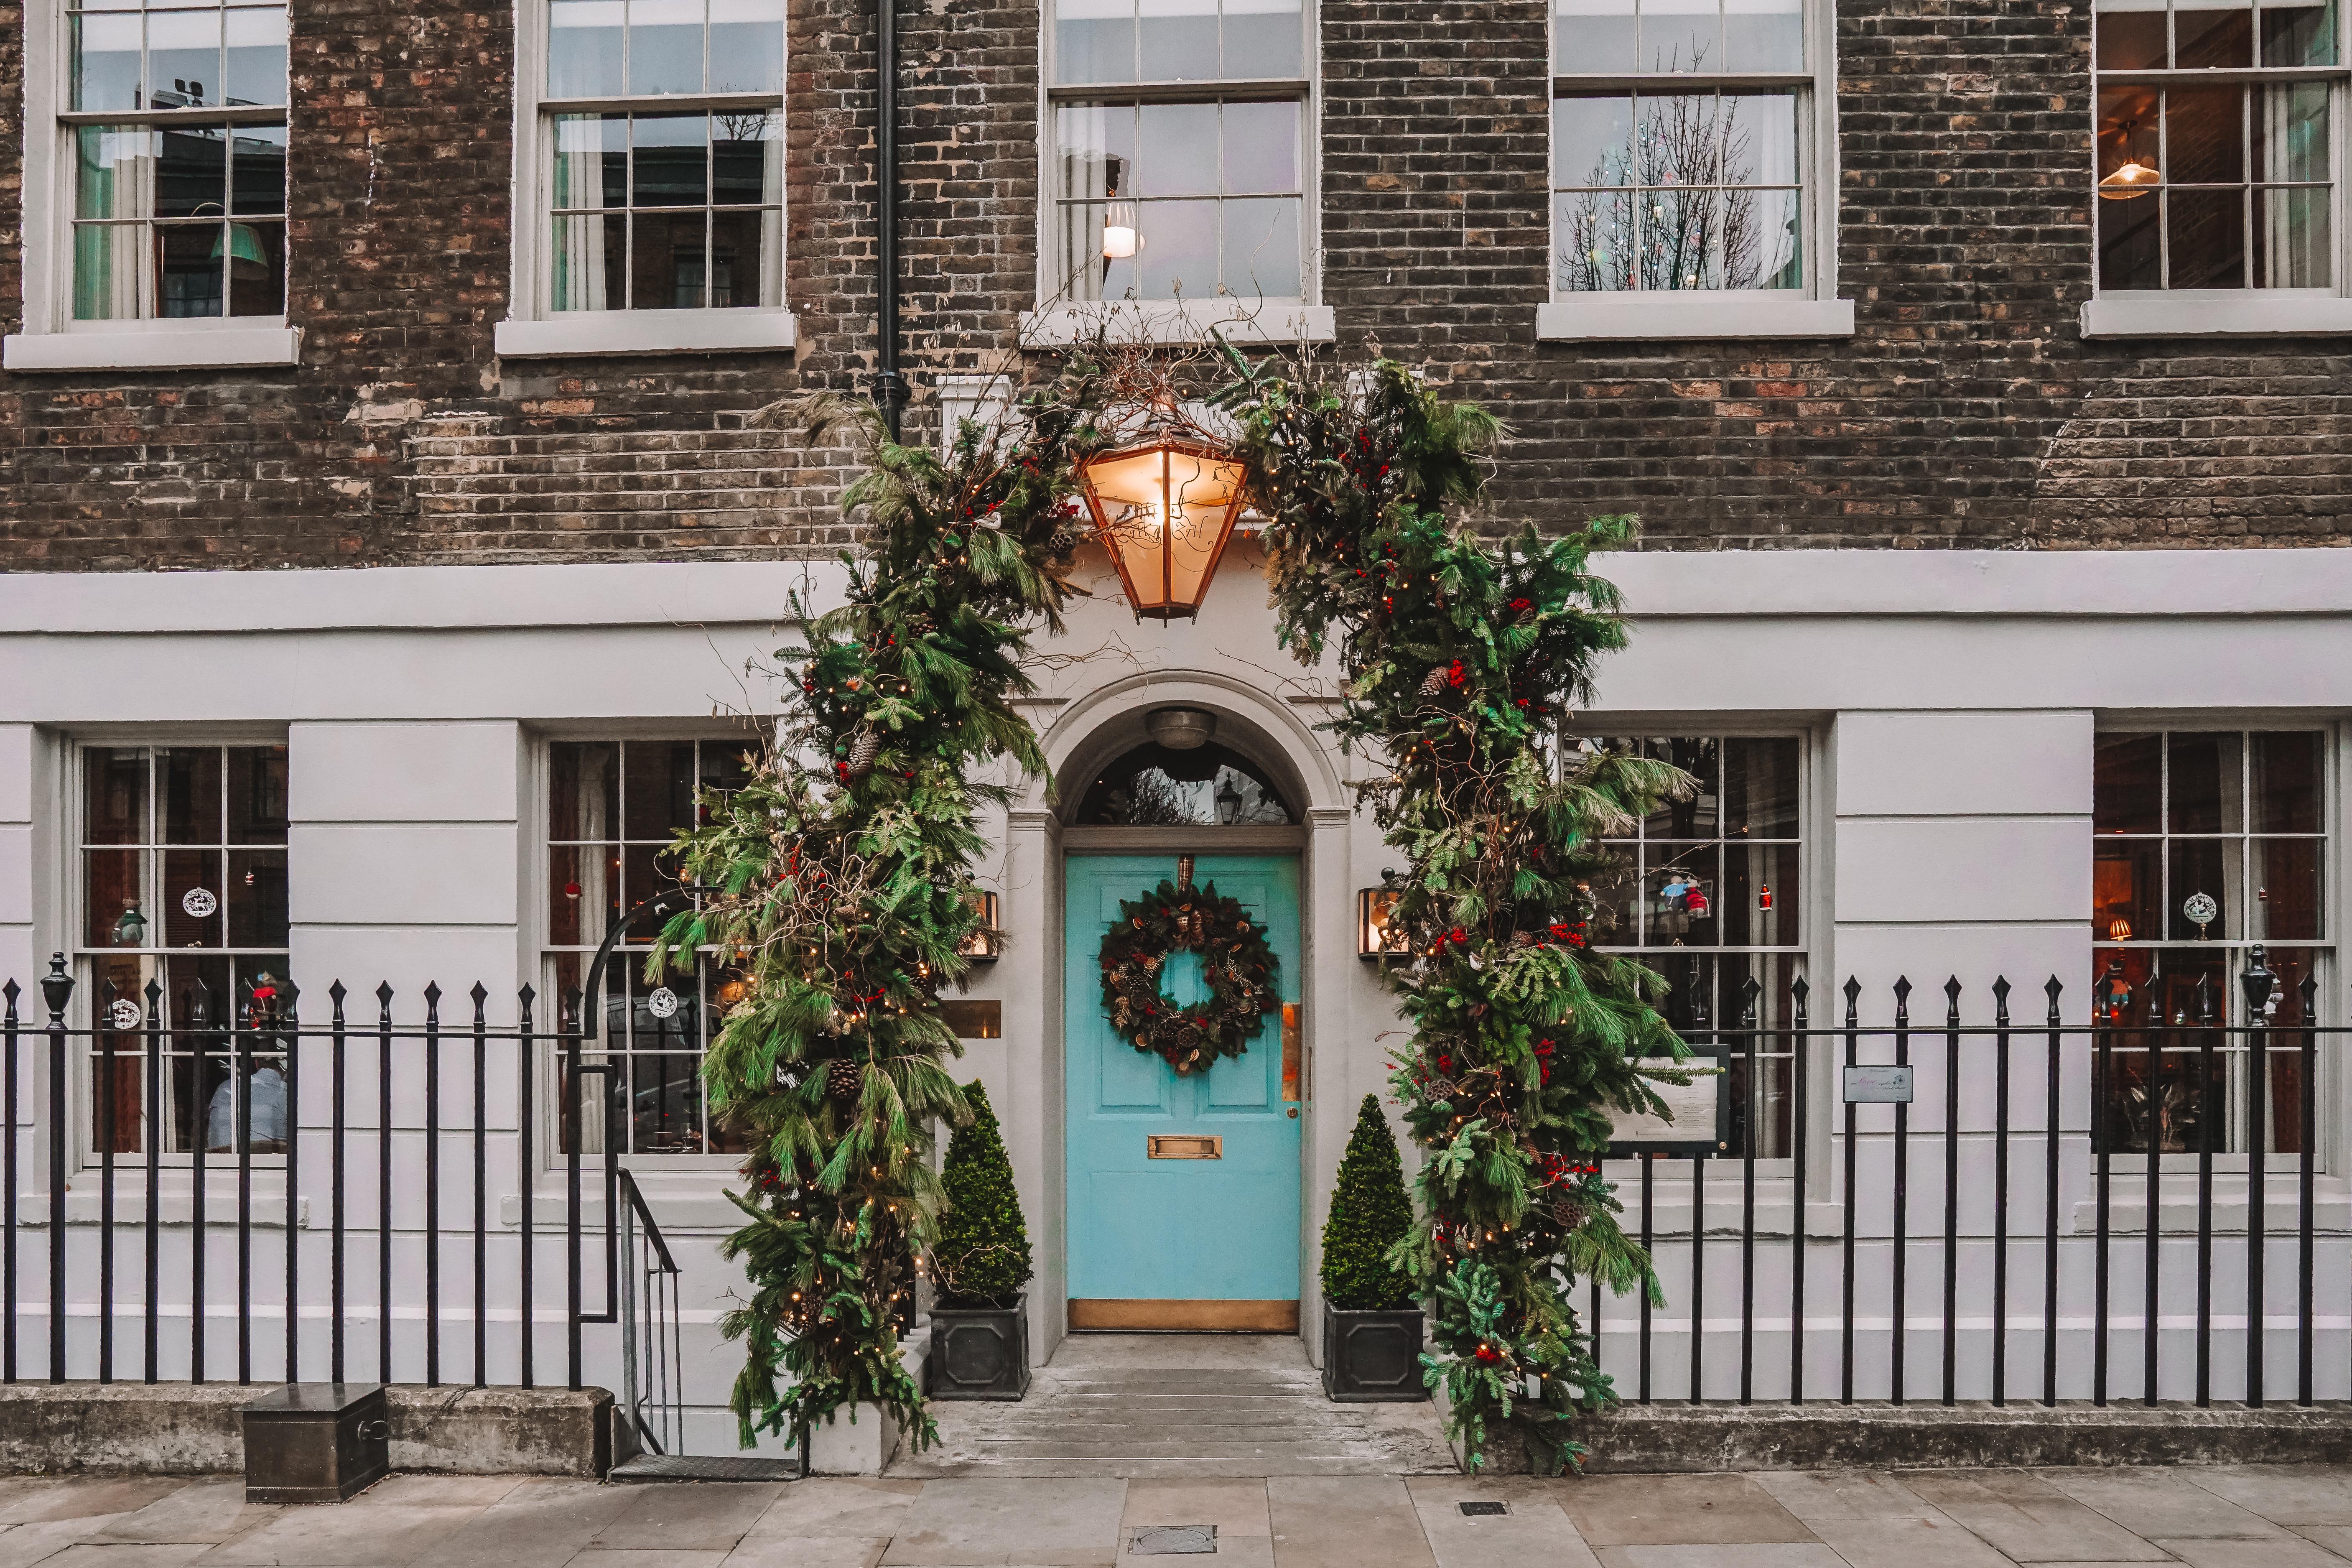 Christmas in London | London's Best Festive Displays | Clerkenwell